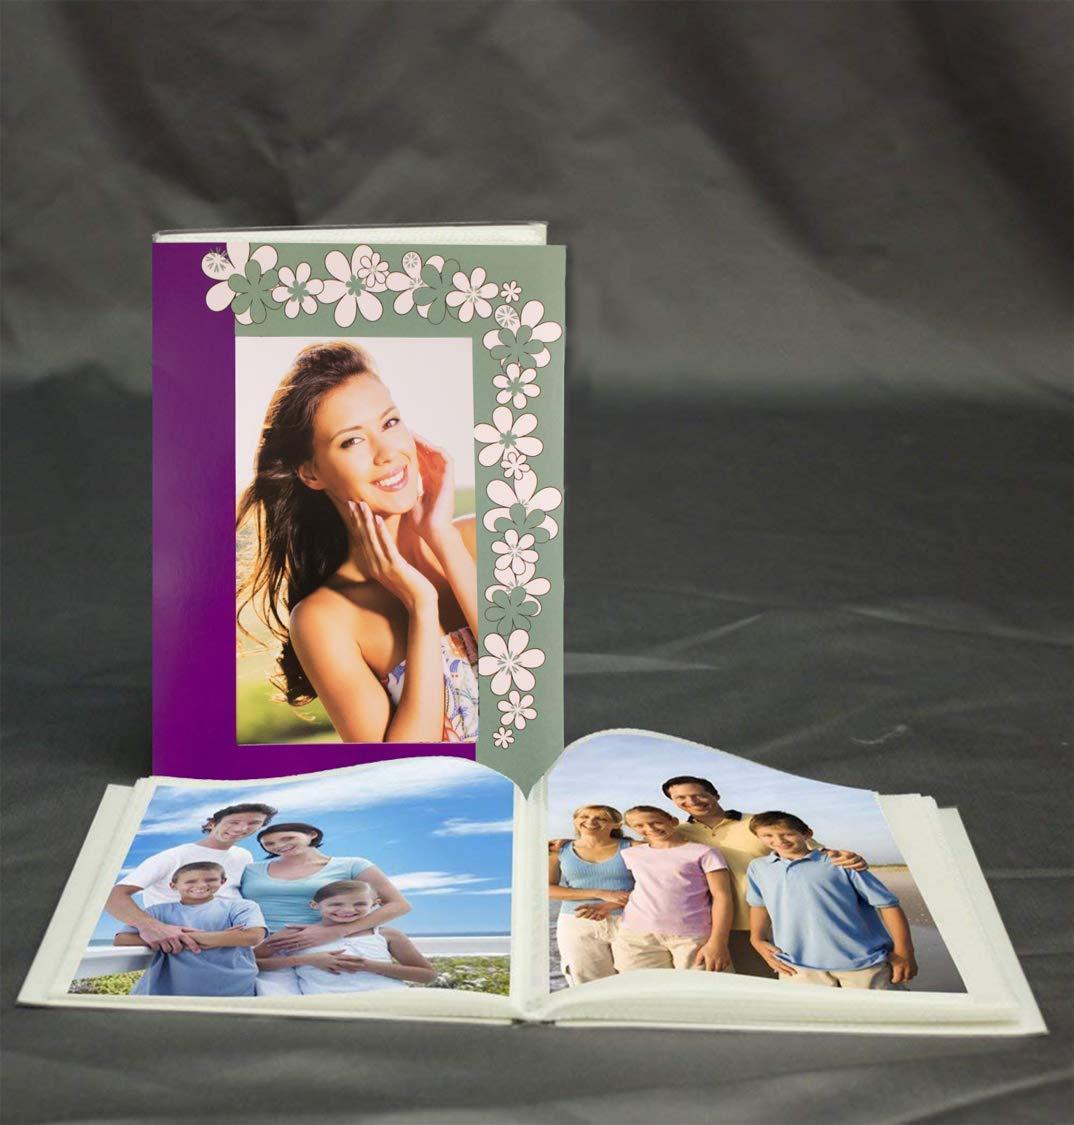 KVD Albums Mini 4x6 Photo Album Brag Book, Various Exquisite Colors and Themes, Durable, Flexible, Holds 36 4 x 6 Photos. Purple/Green Floral